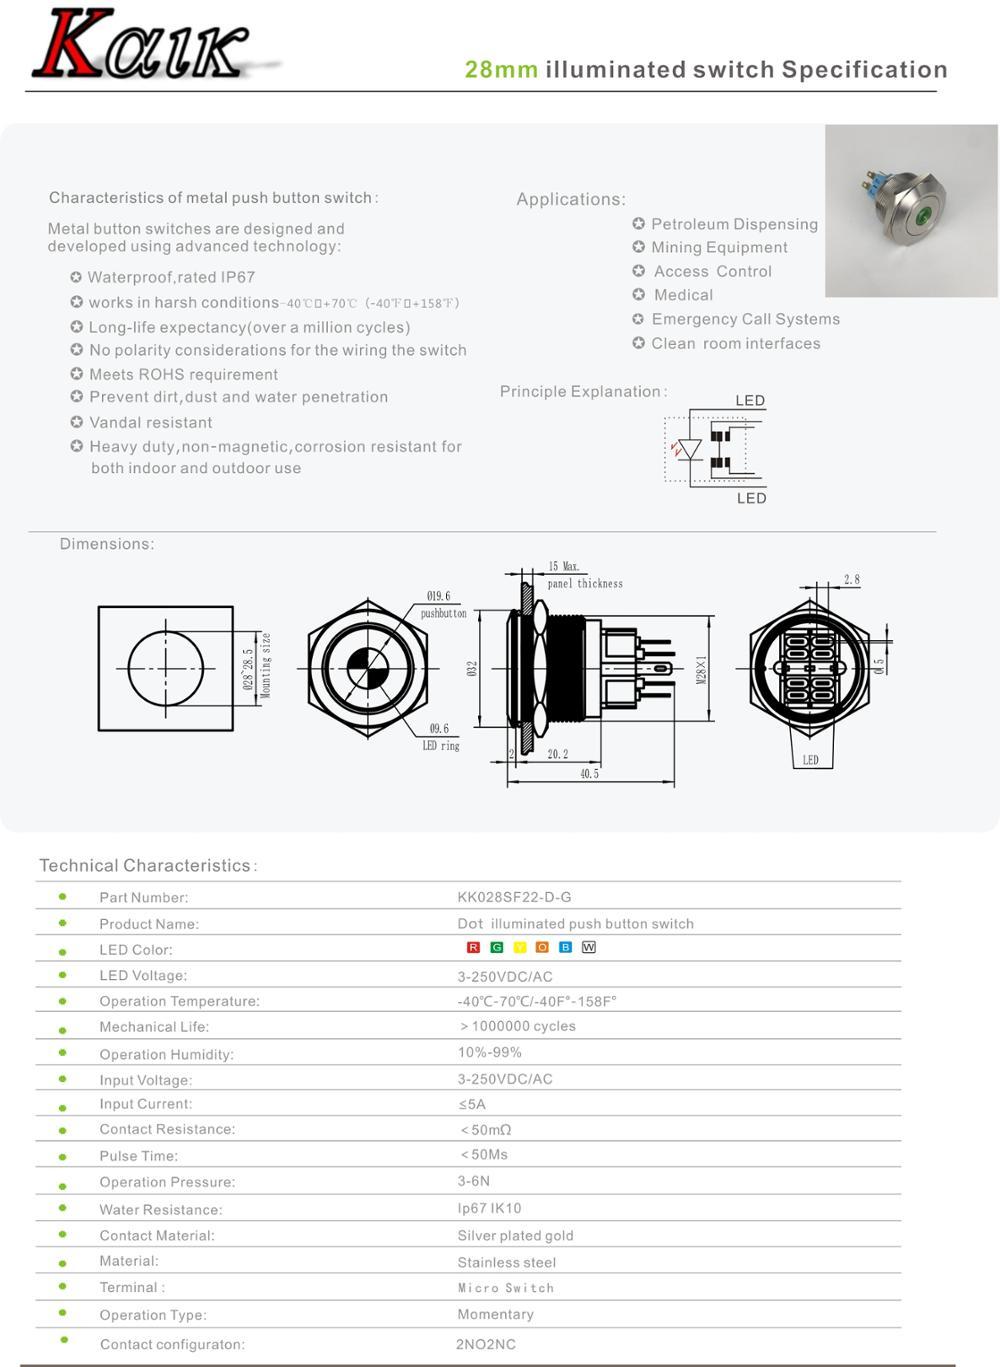 28mm 12v Illuminated Push Button Switch,Momentary,Green